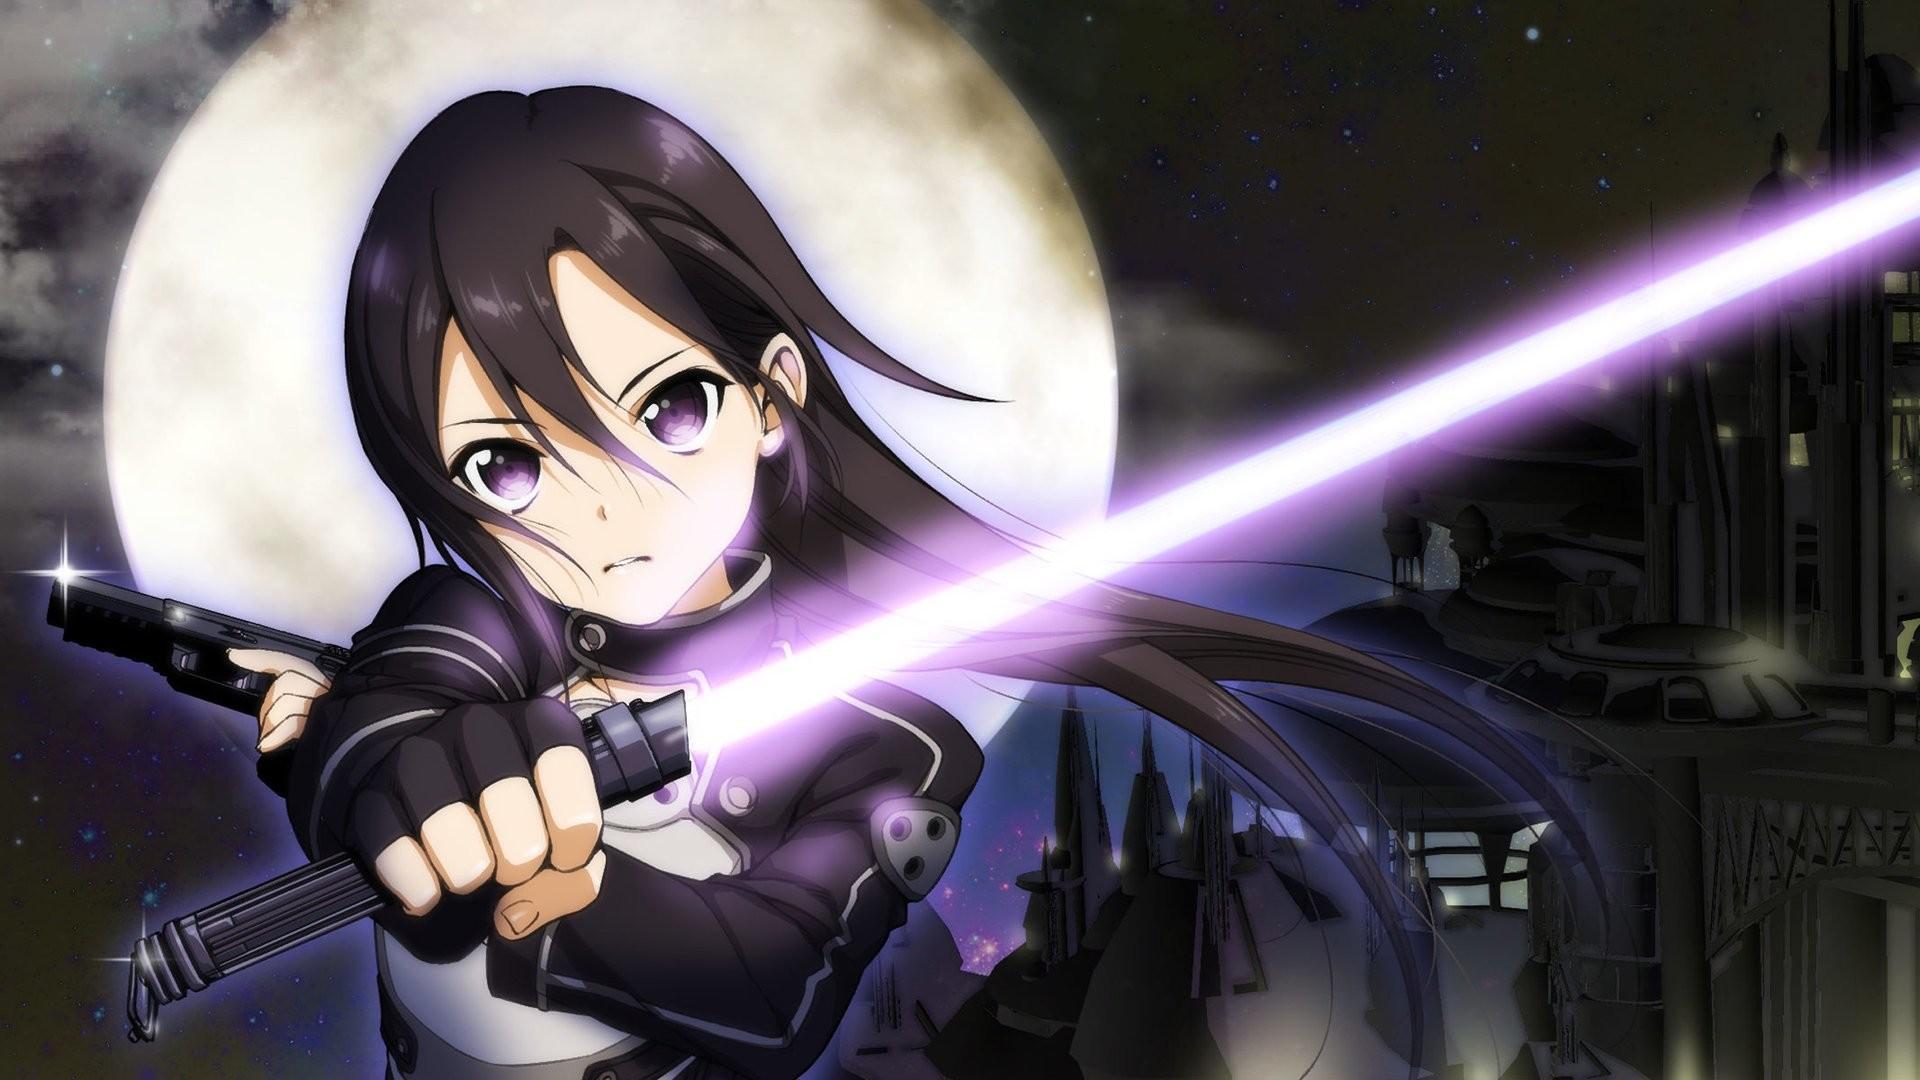 Res: 1920x1080, SWORD ART ONLINE II animation fighting sci-fi japanese anime 1saoll fantasy  warrior wallpaper |  | 626108 | WallpaperUP